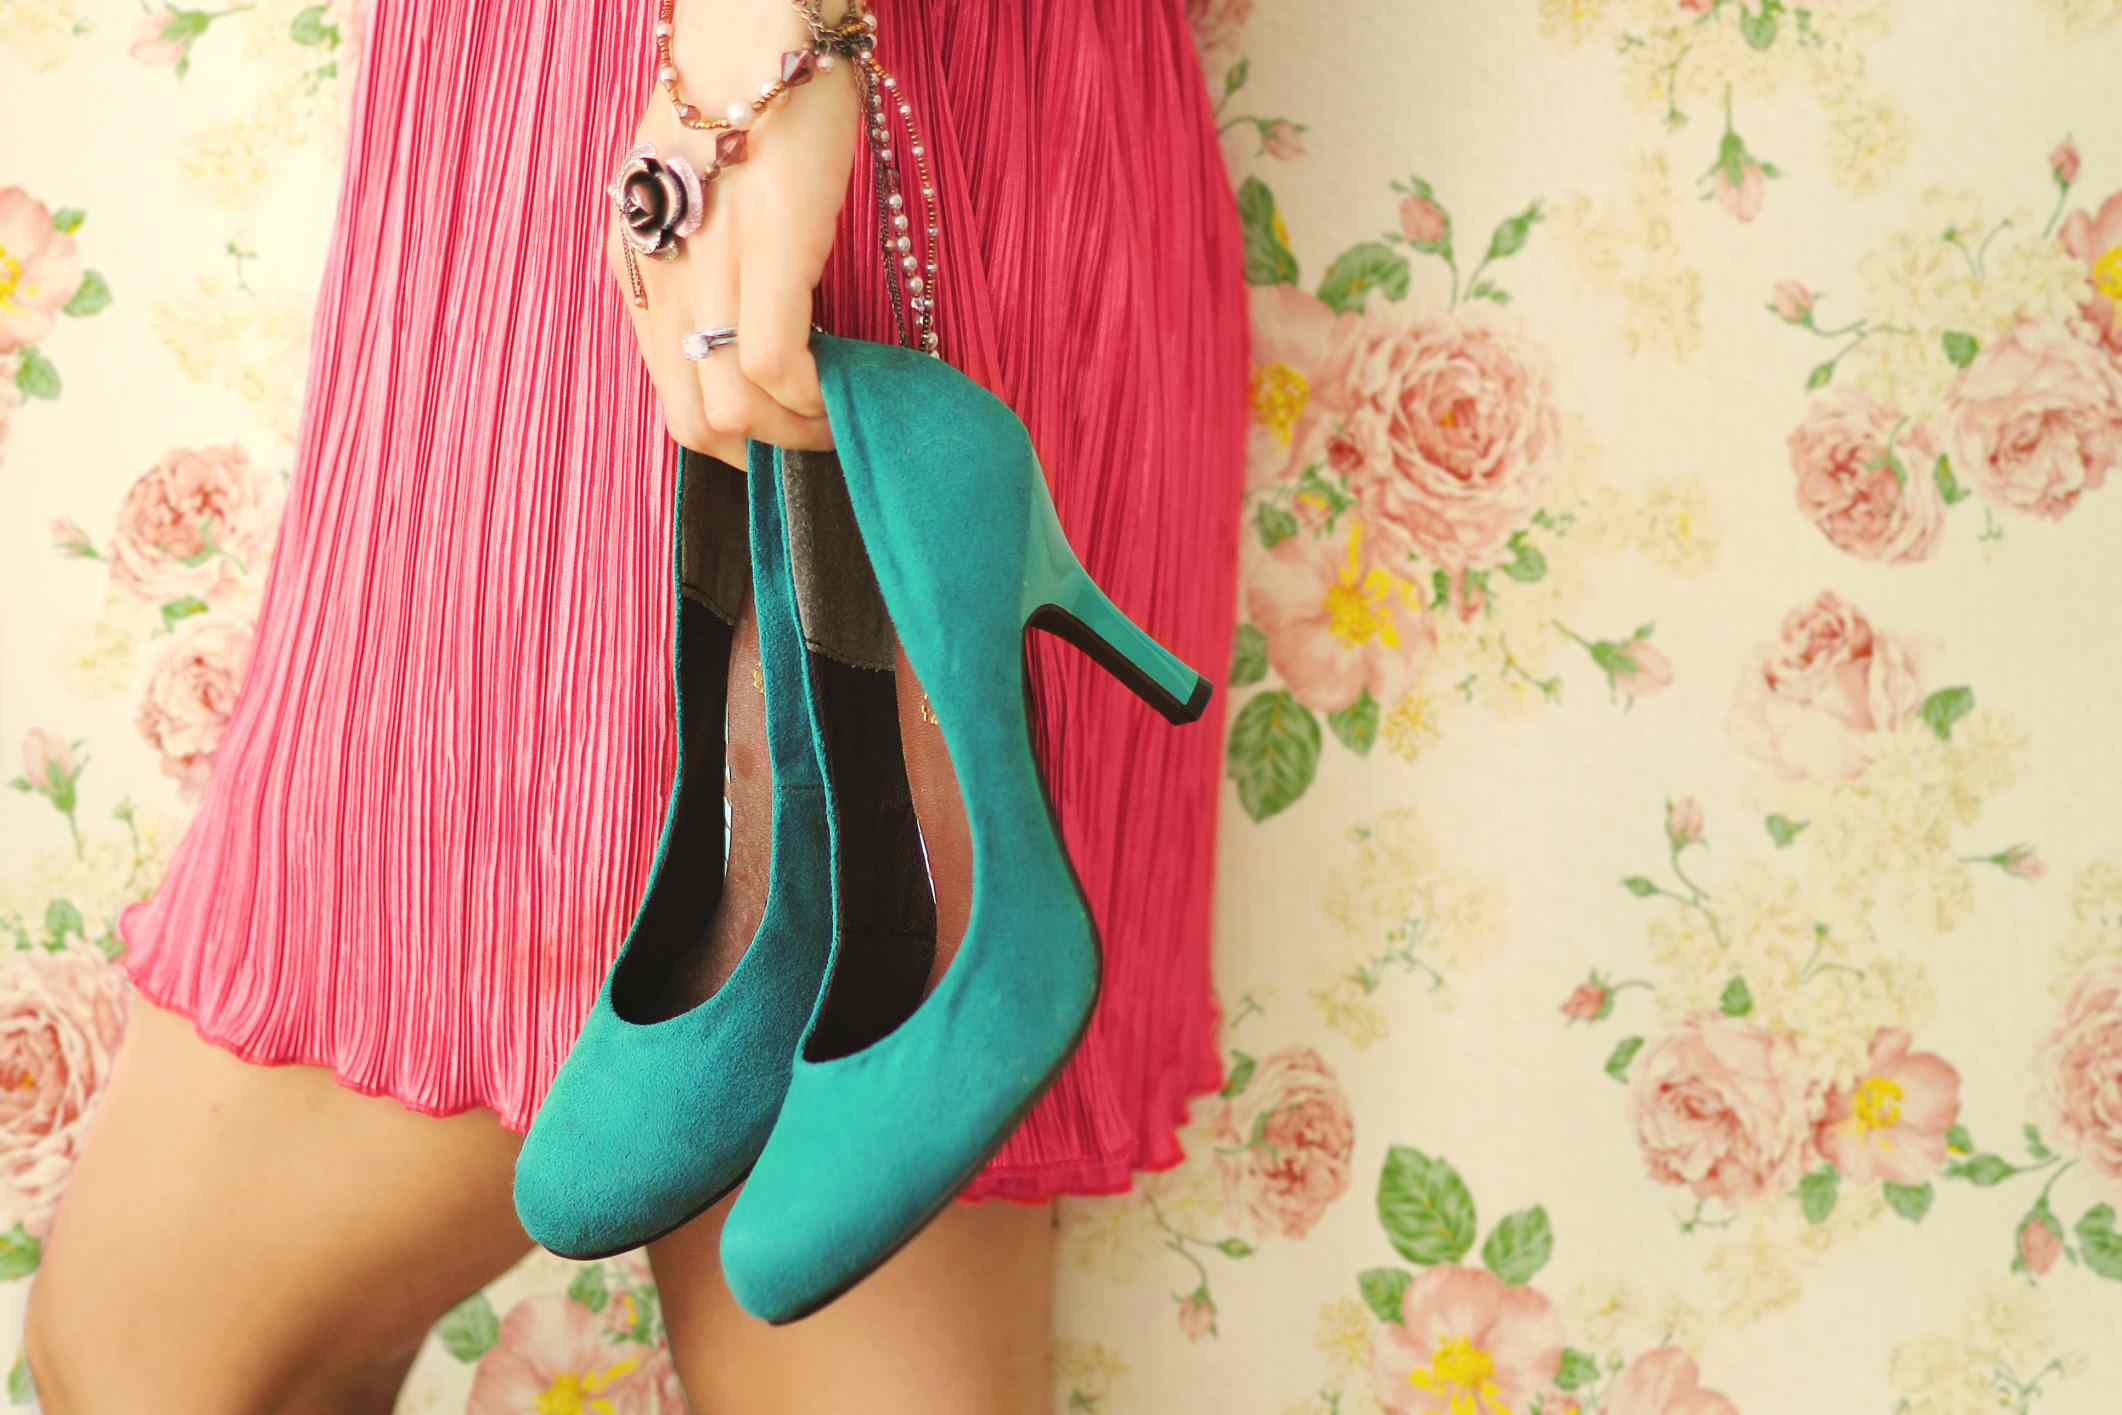 Woman holding blue heels